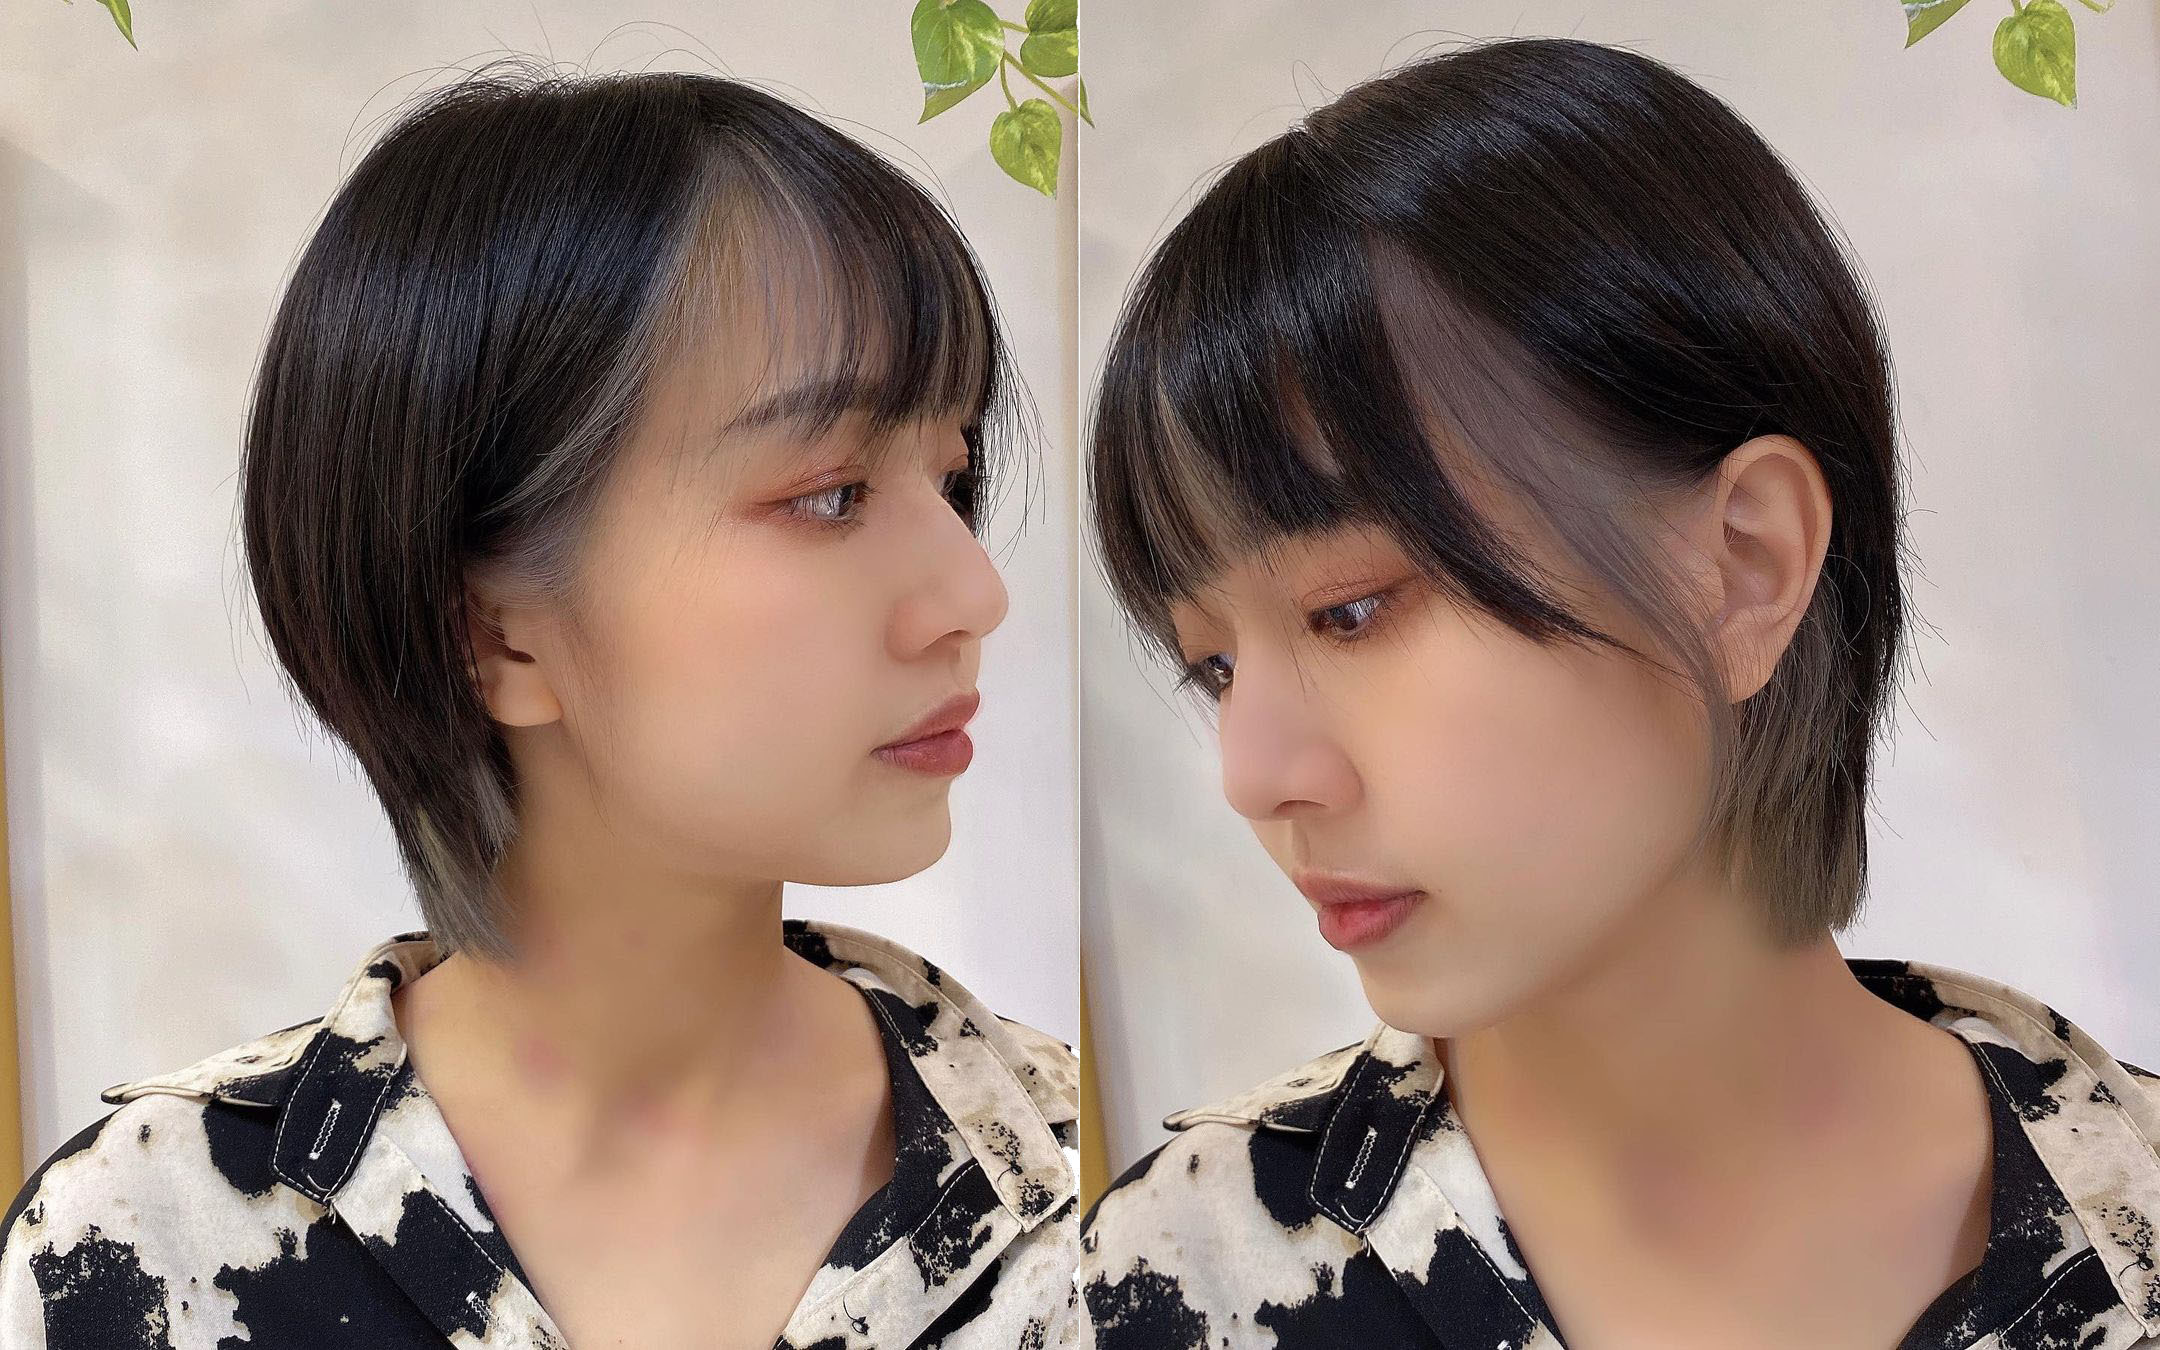 Ink Hair 設計師作品集-大勢短髮寶典|現在短髮美女才是王道,5款熱門短髮造型推薦,大勢短髮女生造型五:日系圓短髮